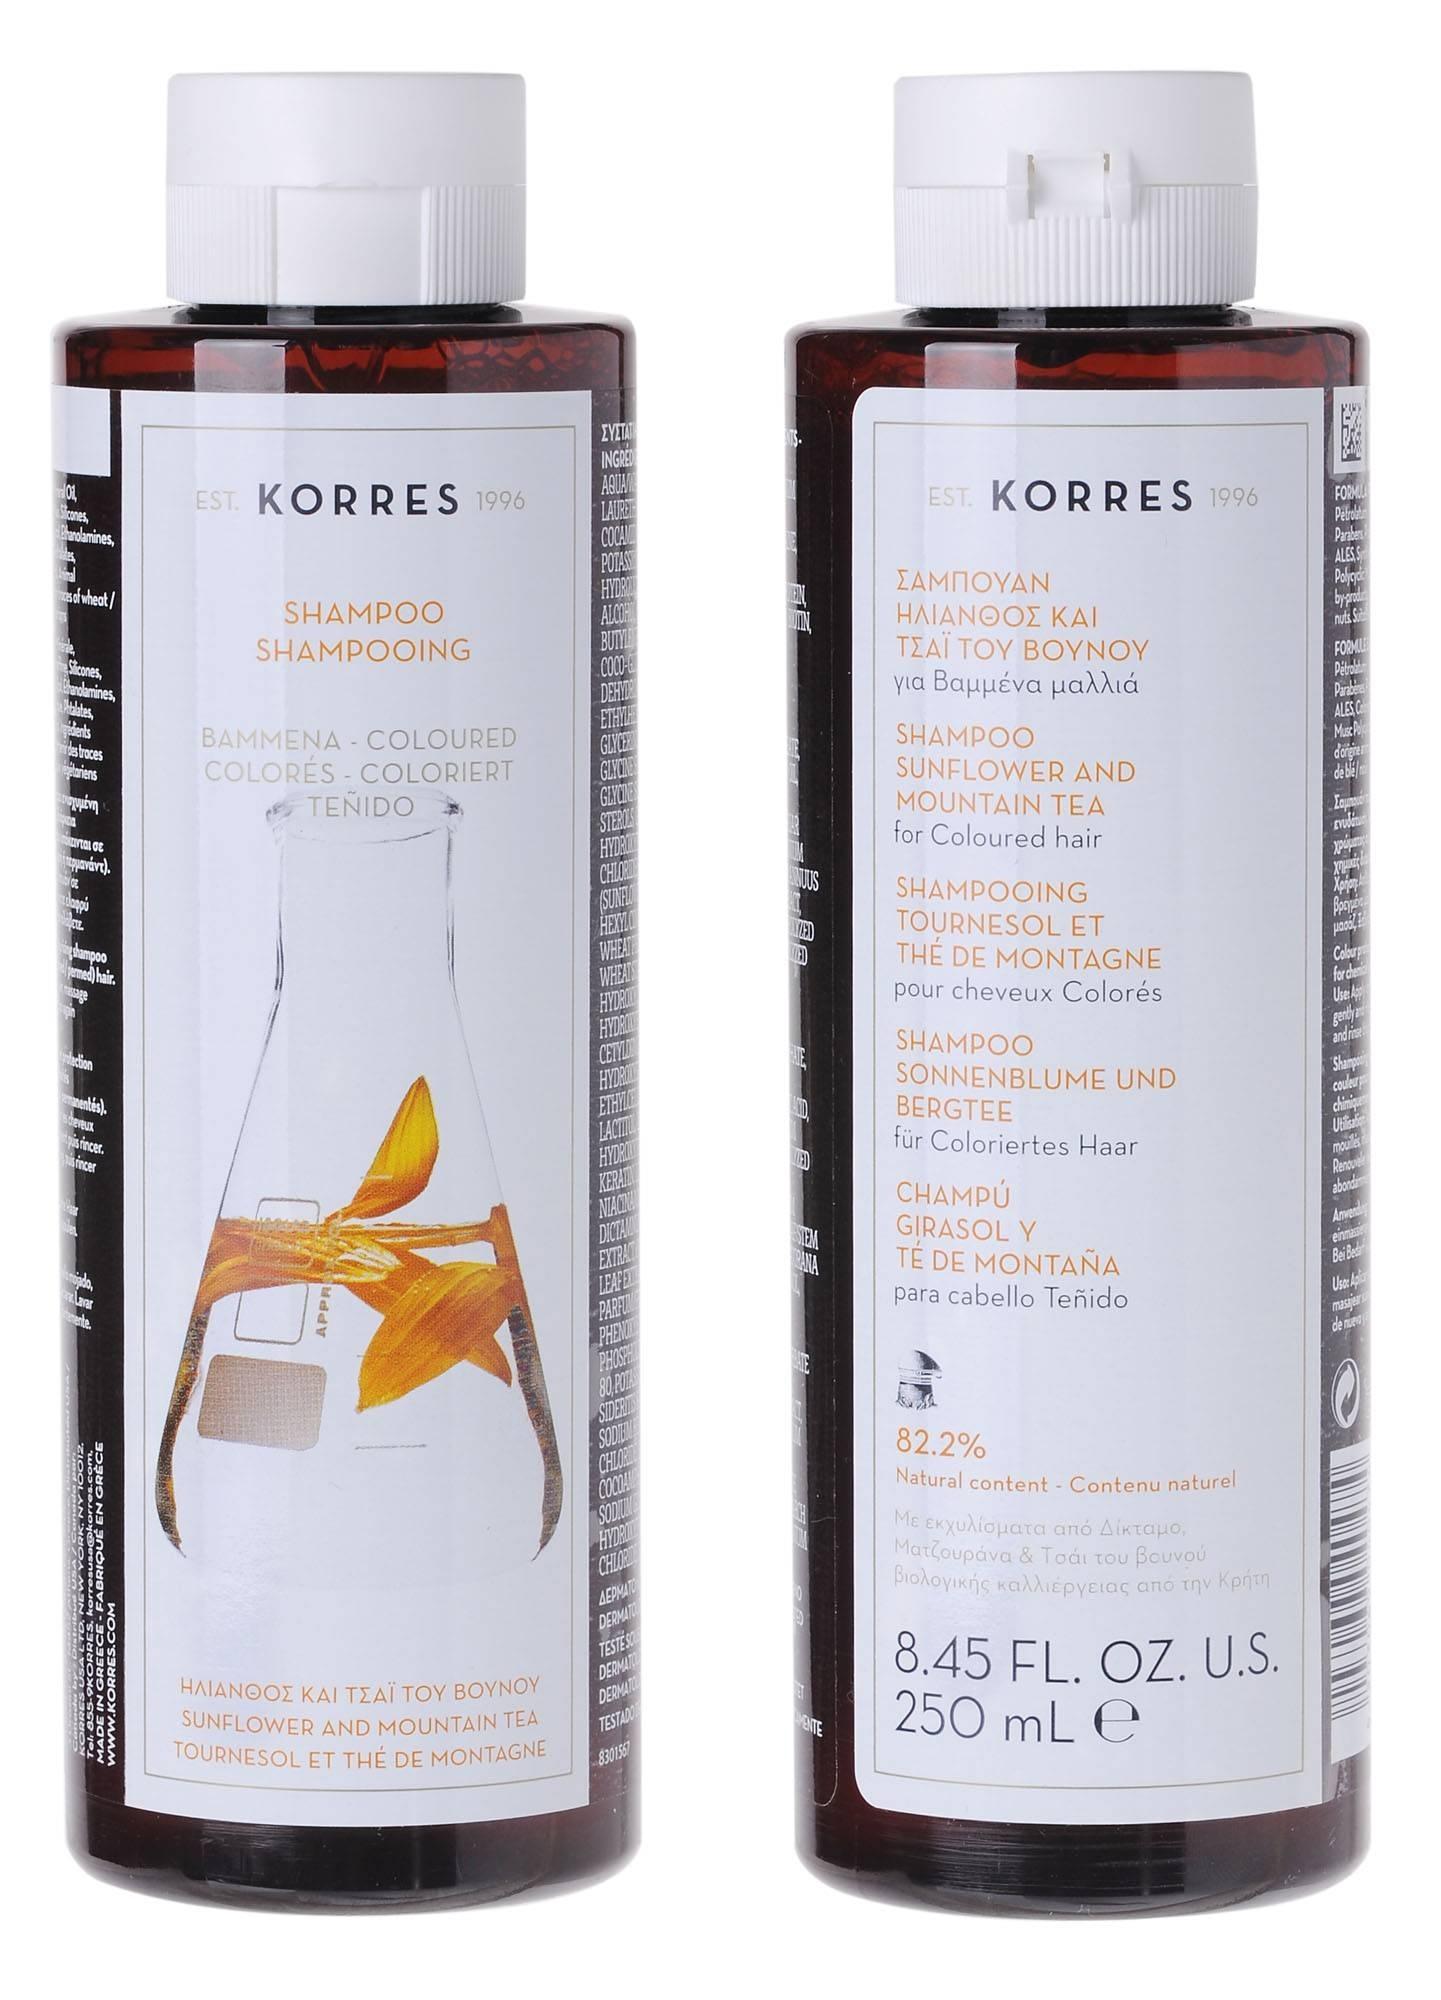 KORRES Shampoo SUNFLOWER & MOUNTAIN TEA - coloured hair 250 ml 730253